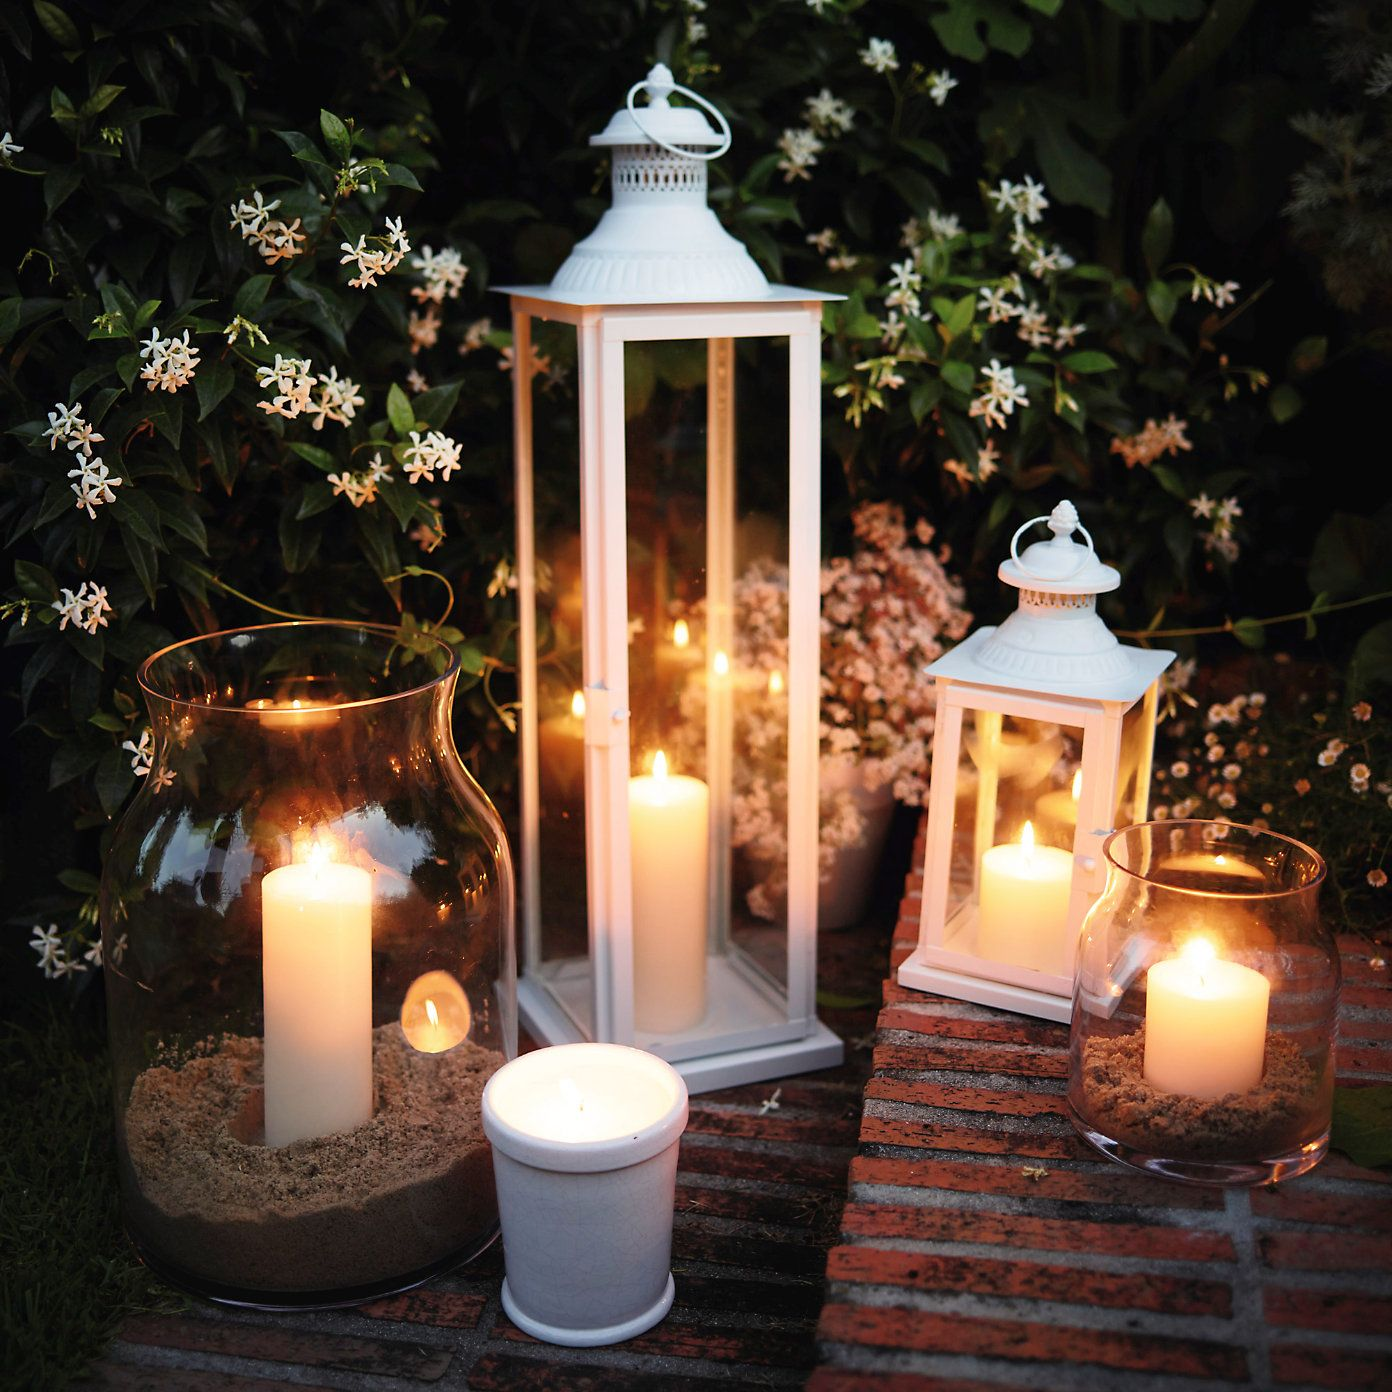 Vintage Lantern Large Vintage Lanterns Outdoor Candles Candles